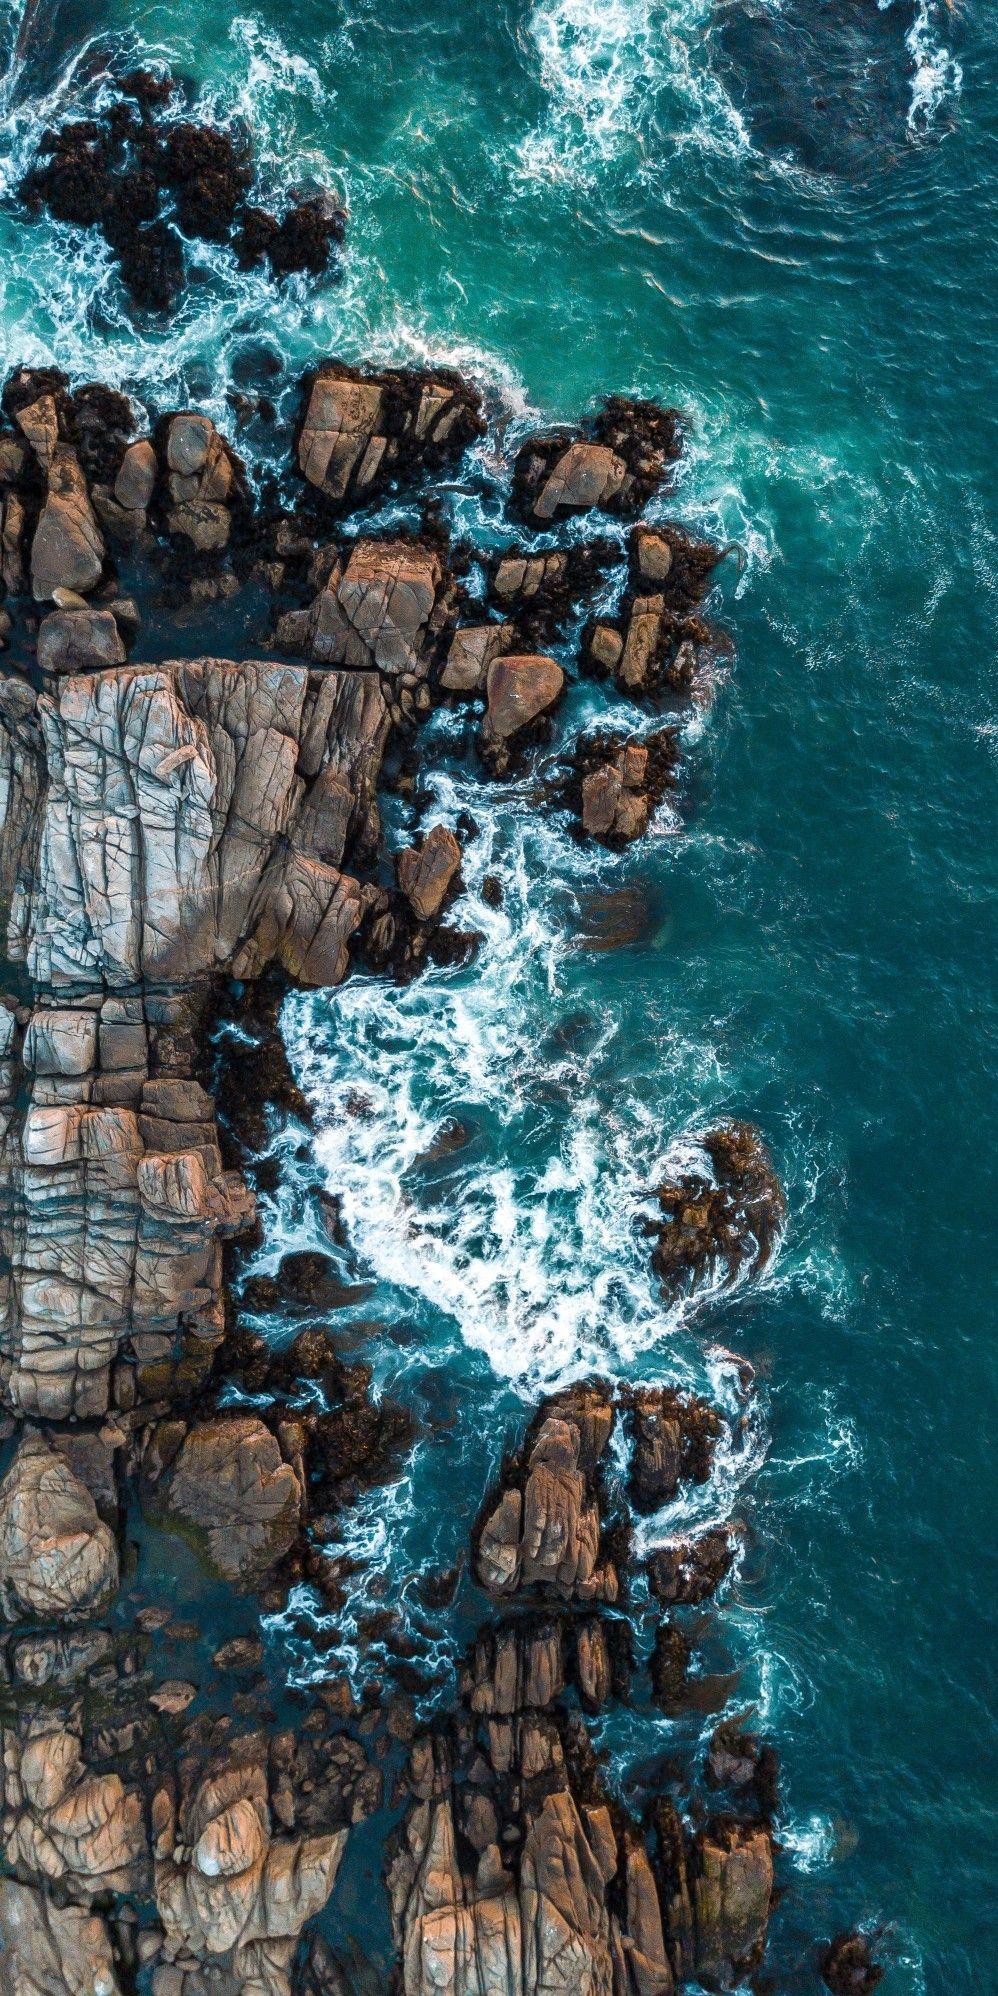 Confusing Cool Pictures For Wallpaper Ocean Wallpaper Nature Wallpaper